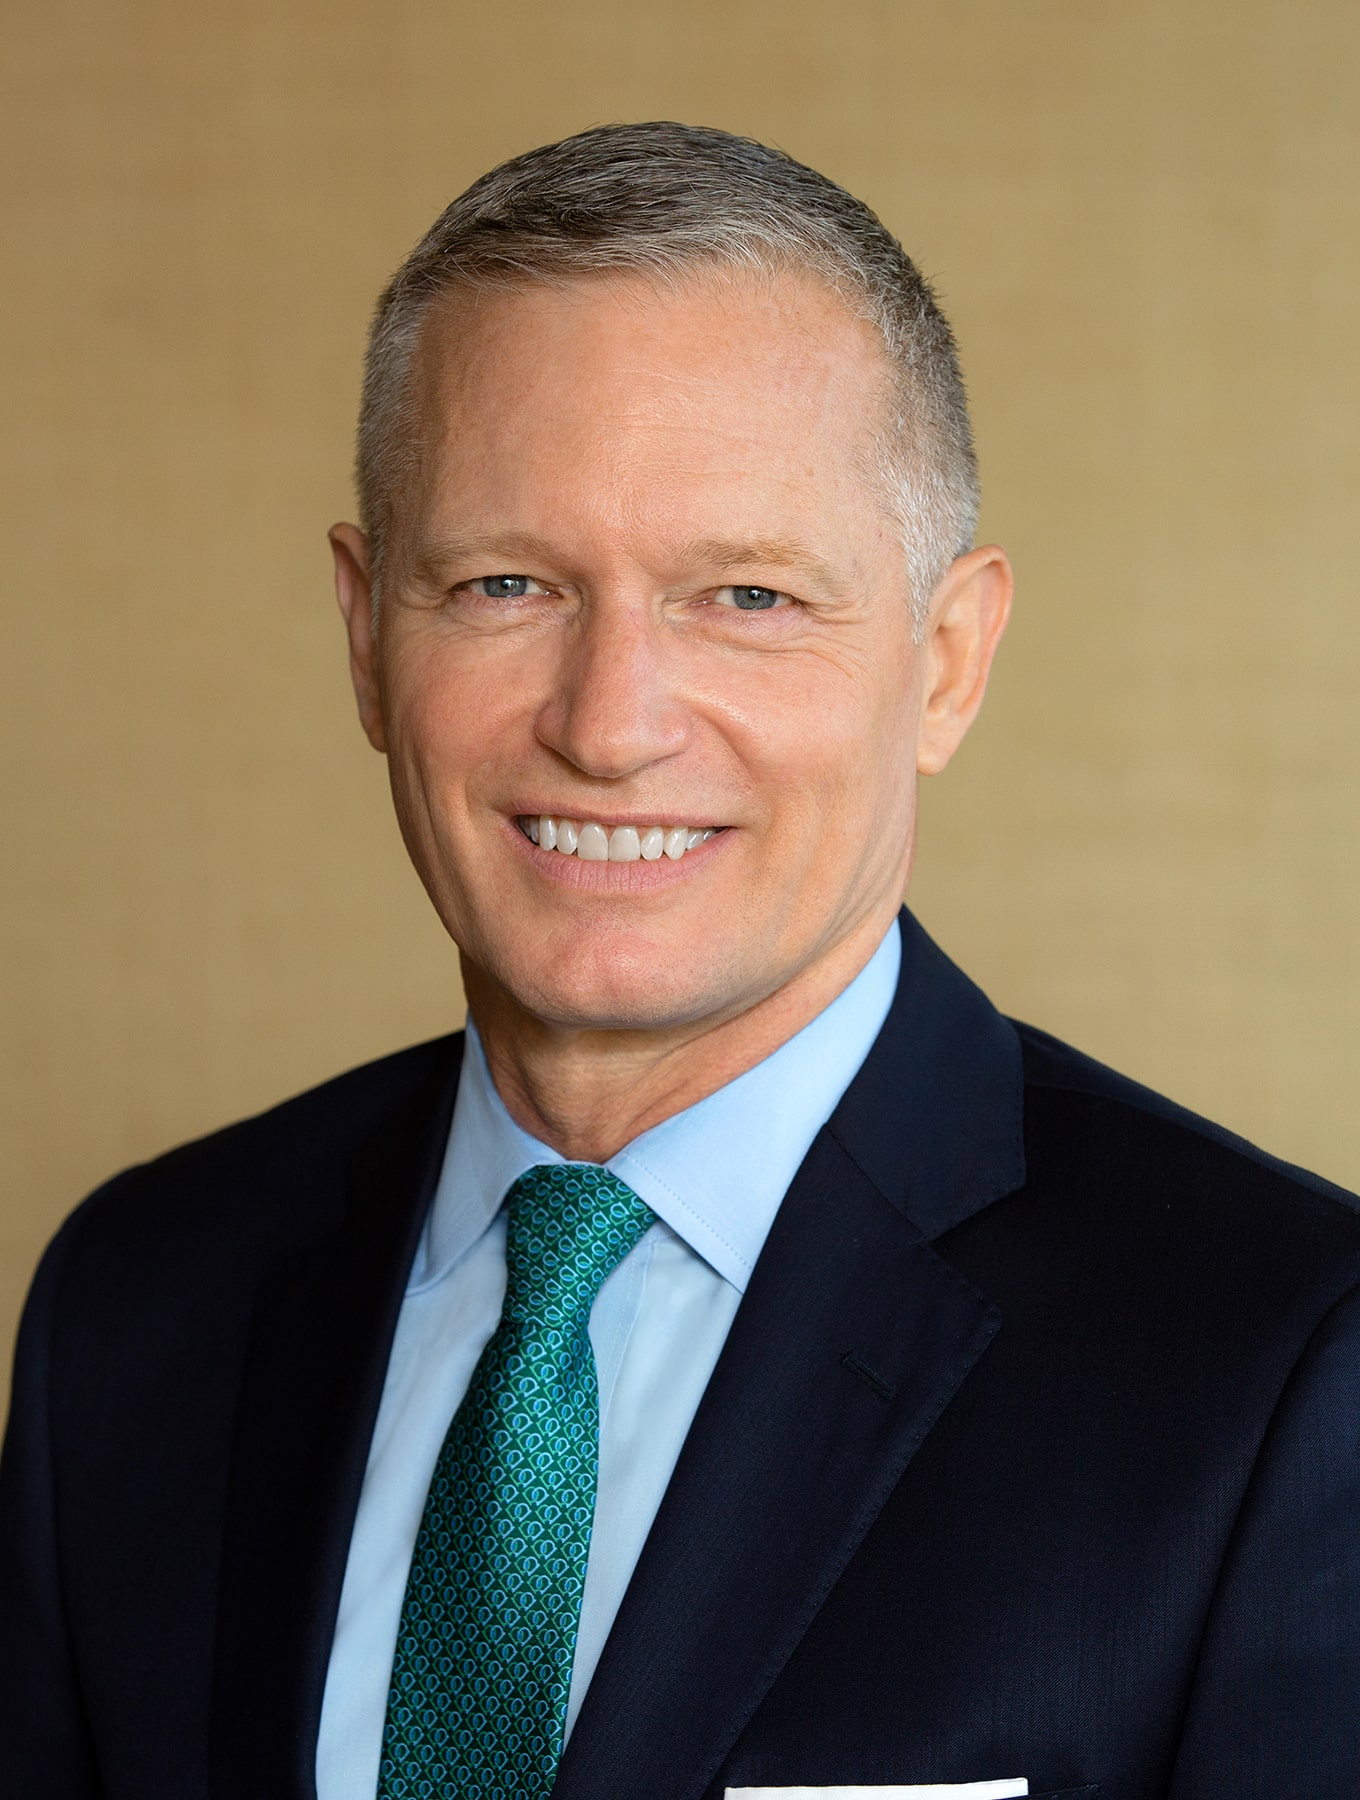 Christopher G. Long